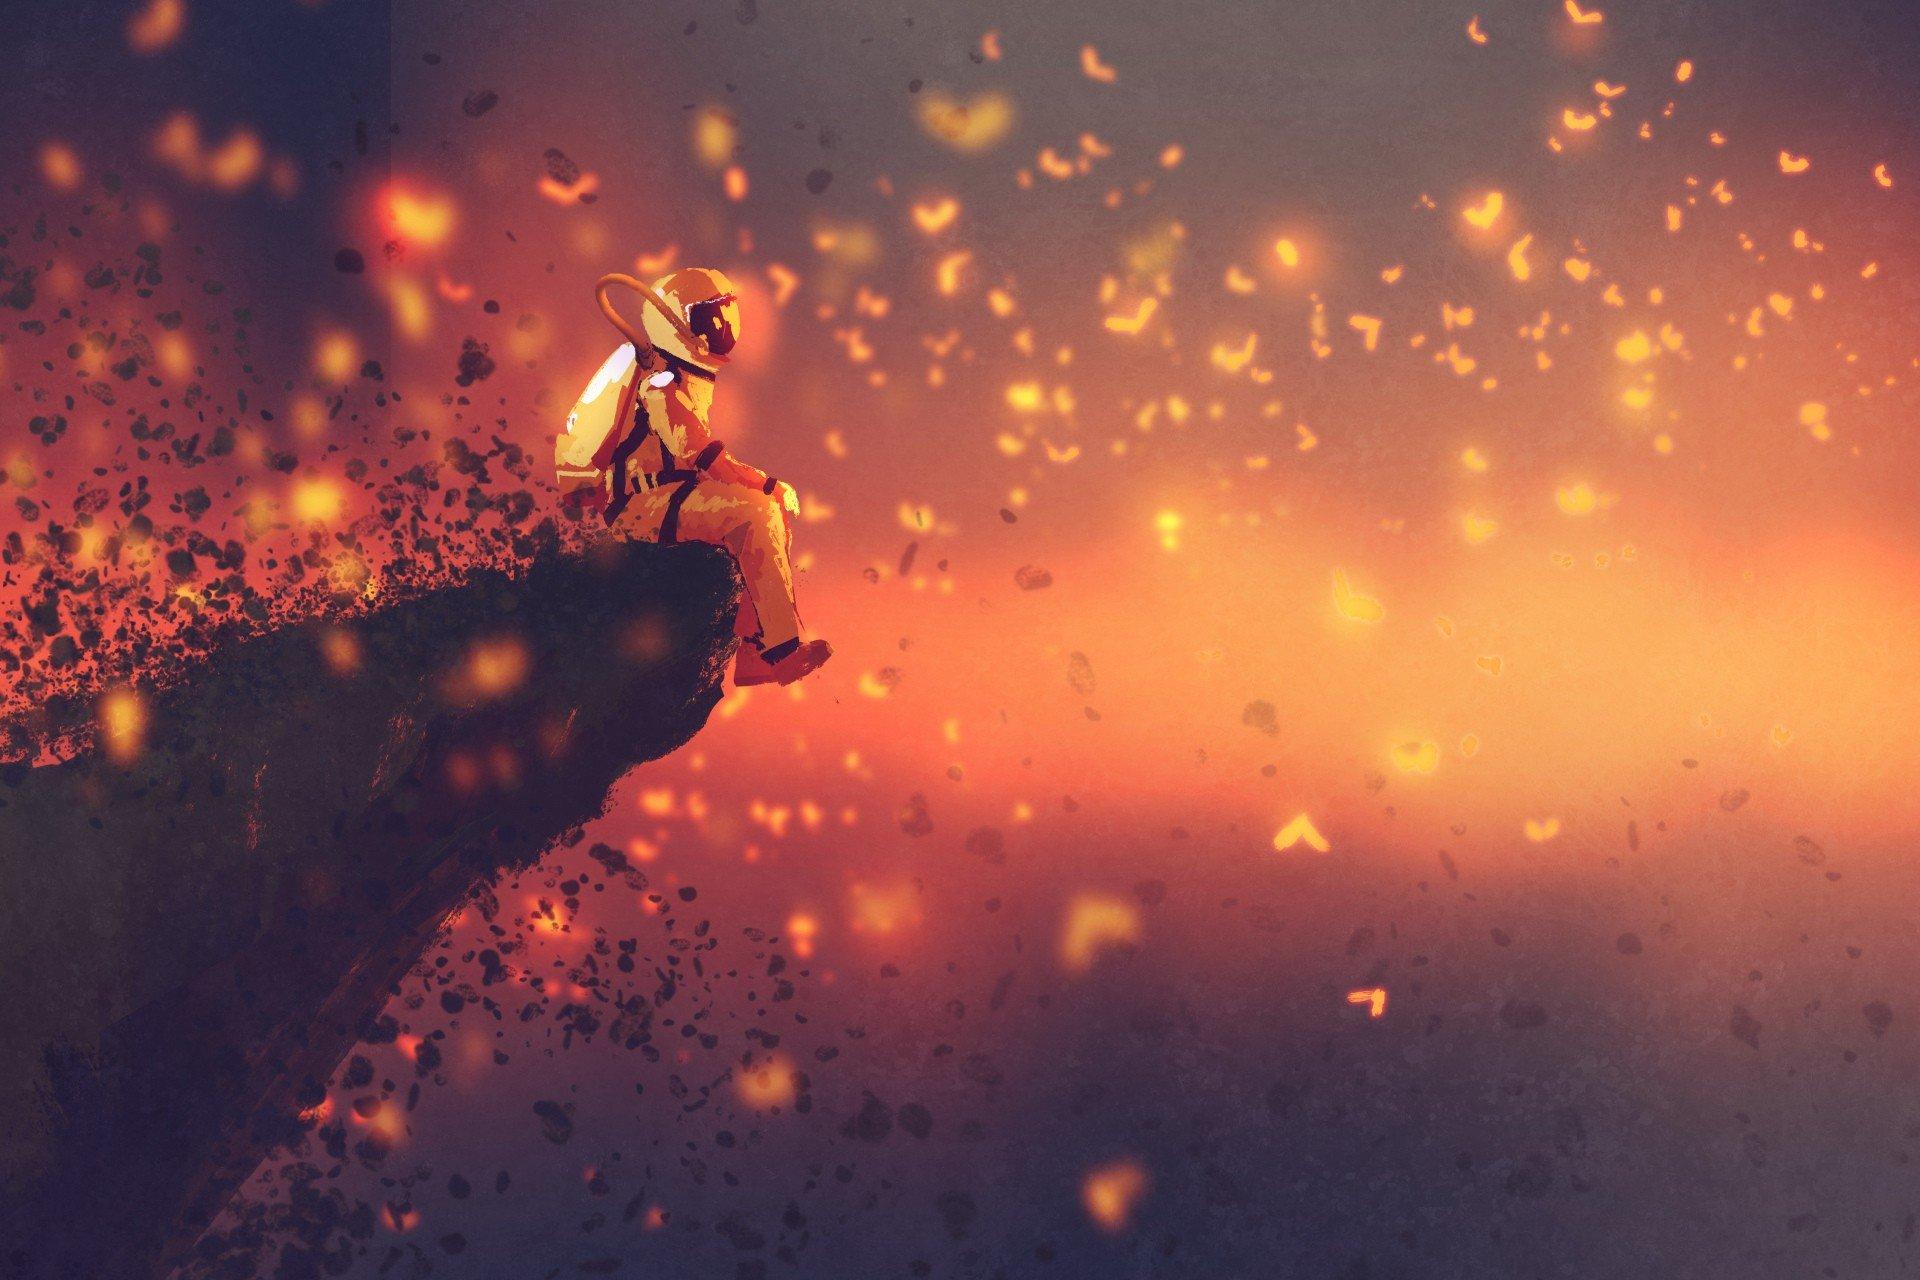 Astronaut digital art butterfly hd wallpapers desktop - Art wallpaper hd for mobile ...